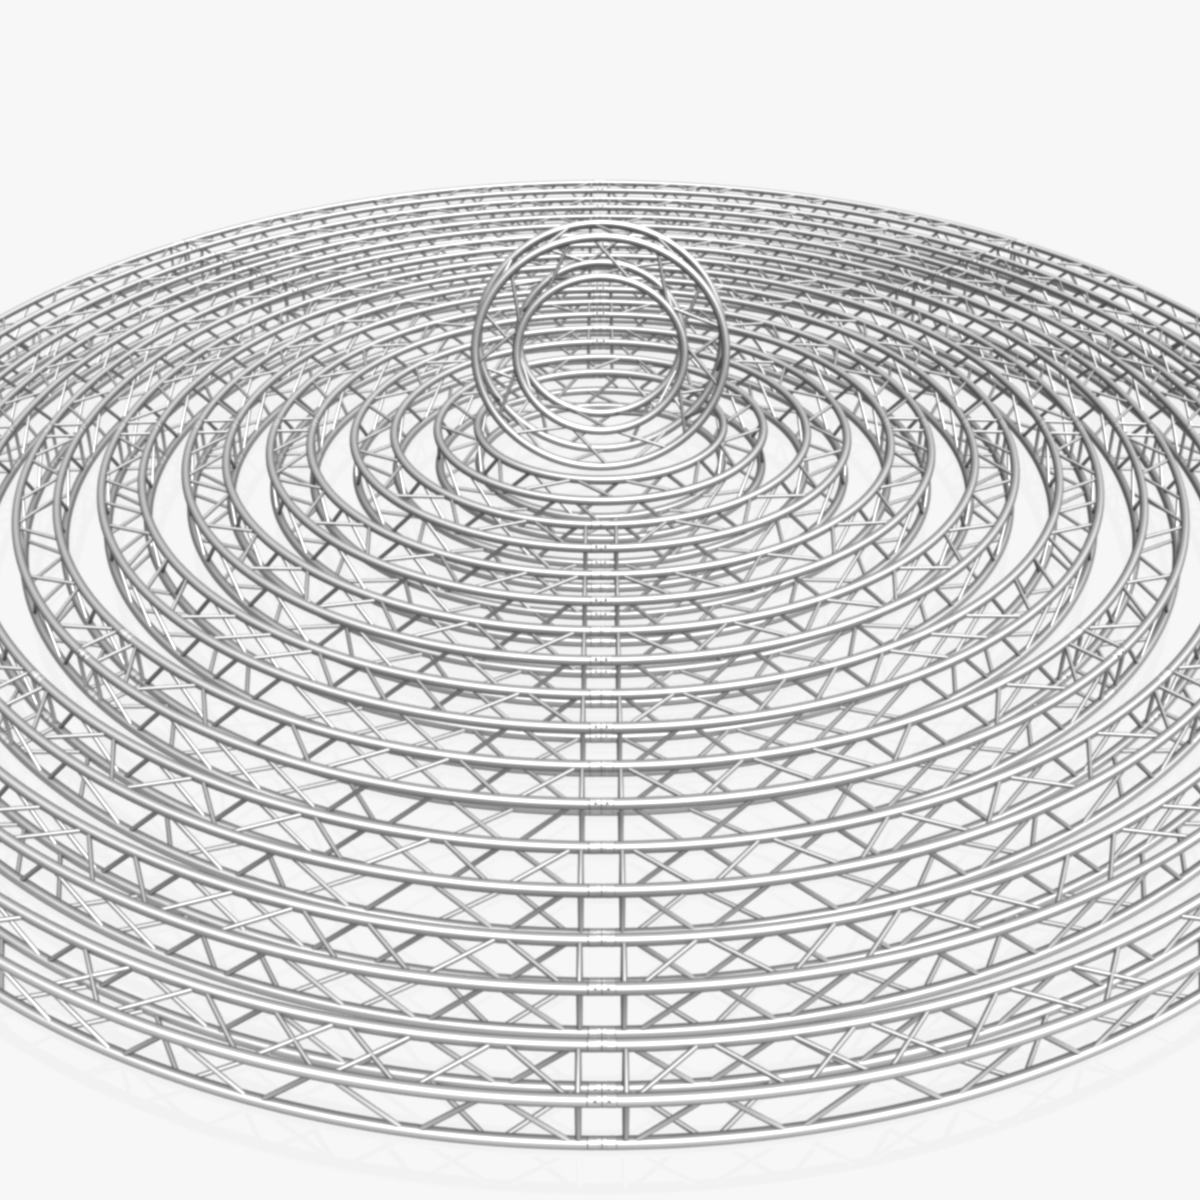 circle square truss modular collection 3d model 3ds max dxf fbx c4d dae  texture obj 252330